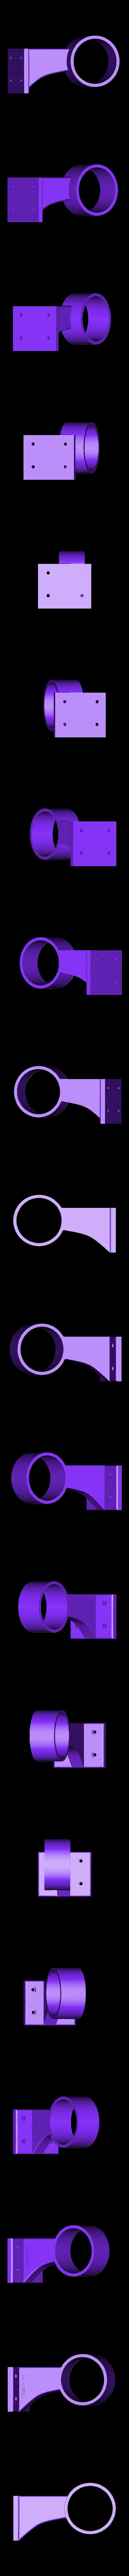 Support_Barre_Rouleau_v2.stl Télécharger fichier STL support bobine imprimante 3d box diamètre 70mm / support bobine imprimante 3d box diamètre 70mm • Design à imprimer en 3D, Spelth